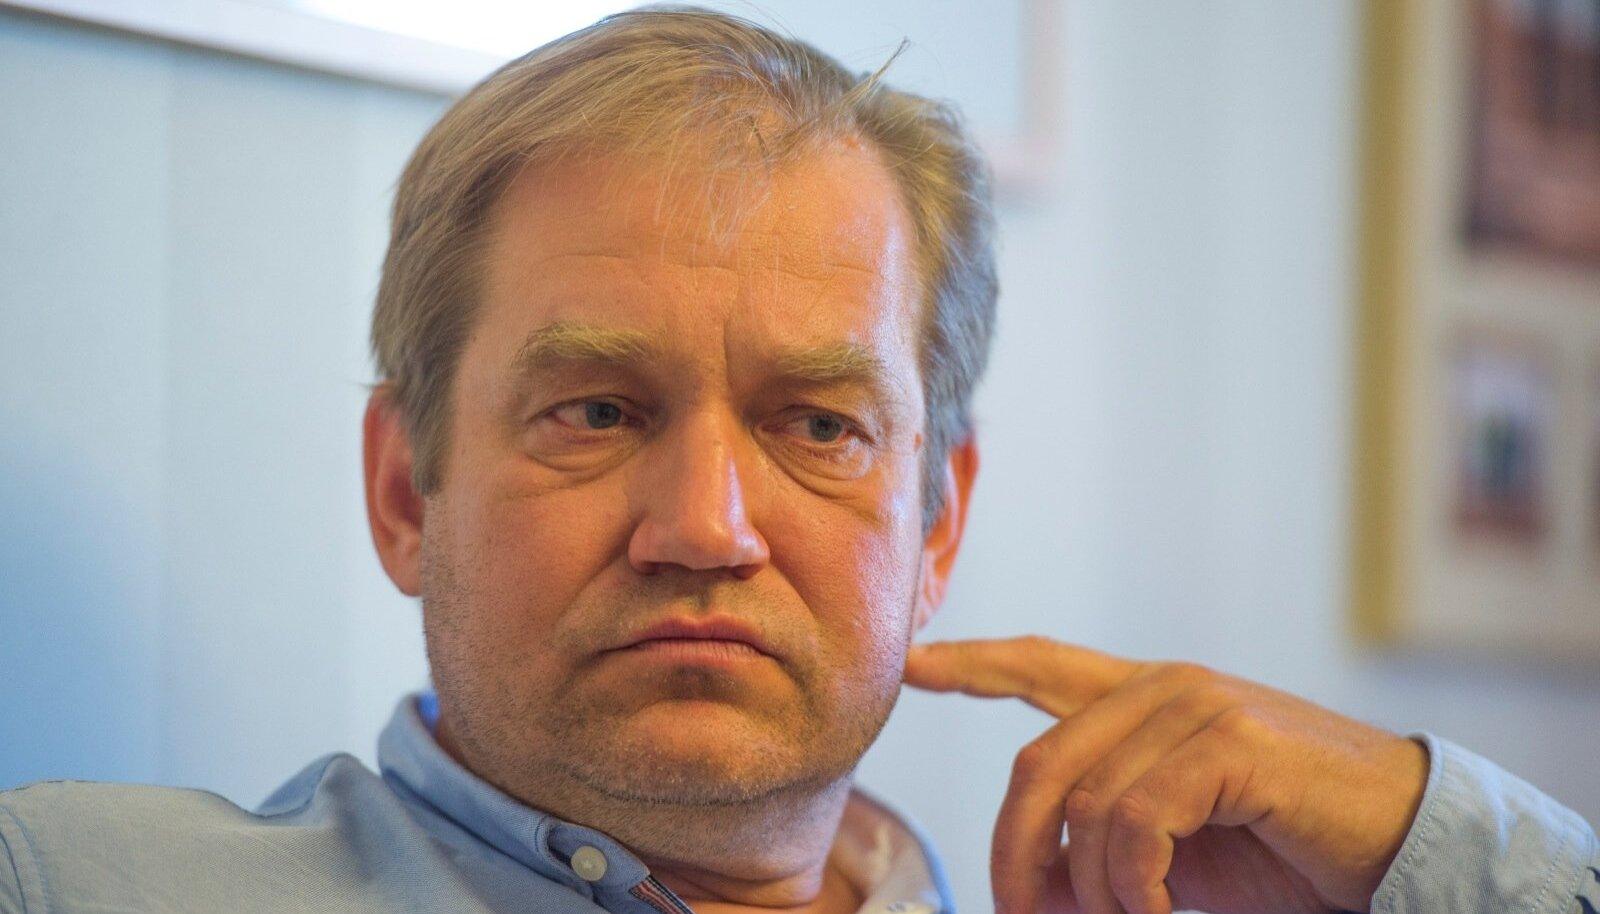 Ivari Padar intervjuul.collection